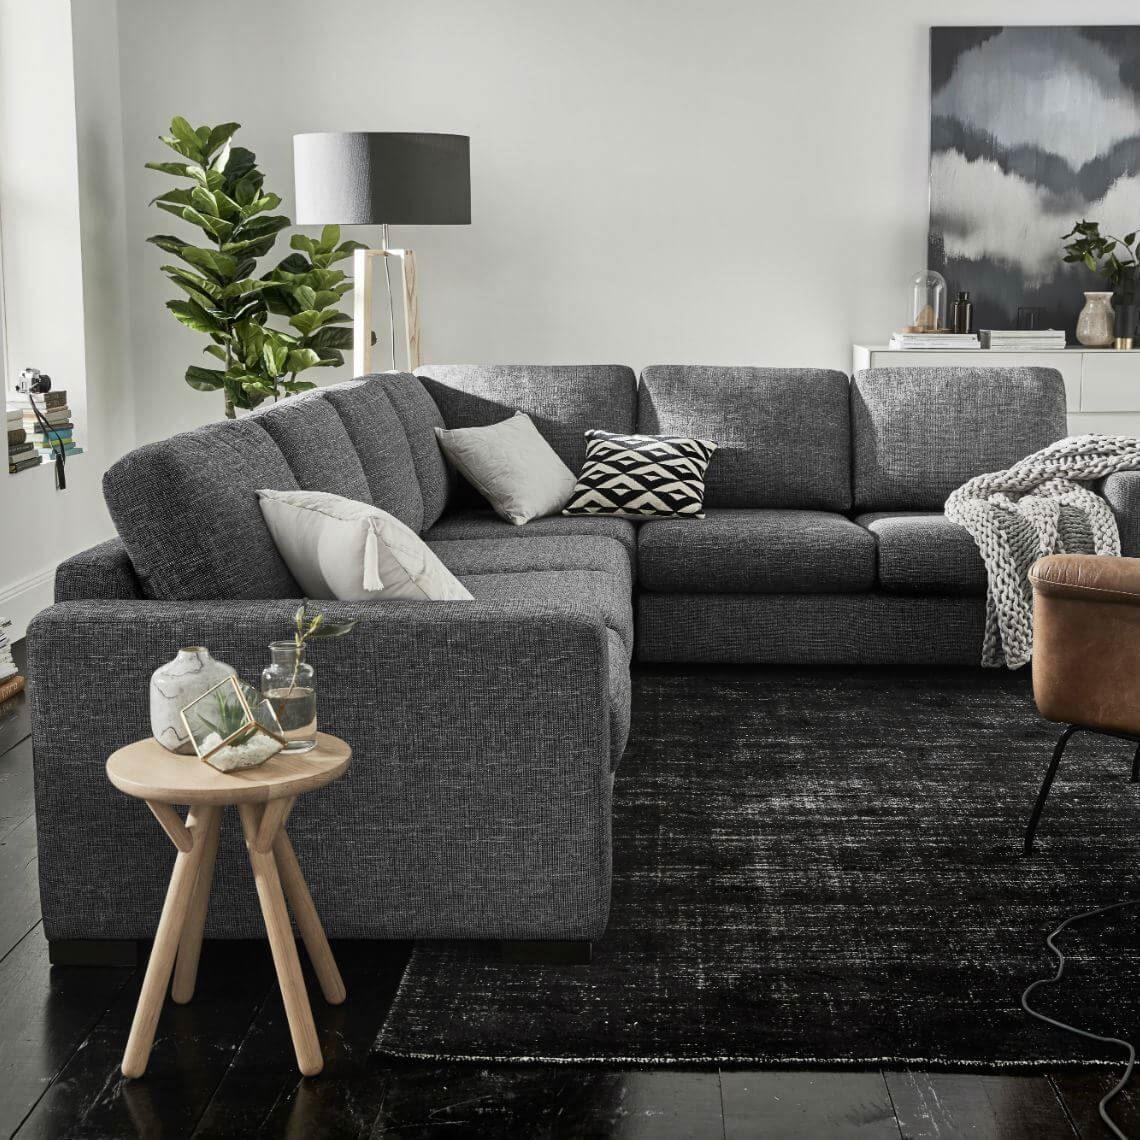 Signature Contemporary 6 Seat Fabric Corner Sofa With Right 2 Seat Modular Standard In 2020 Corner Sofa Unique Sofas Furniture